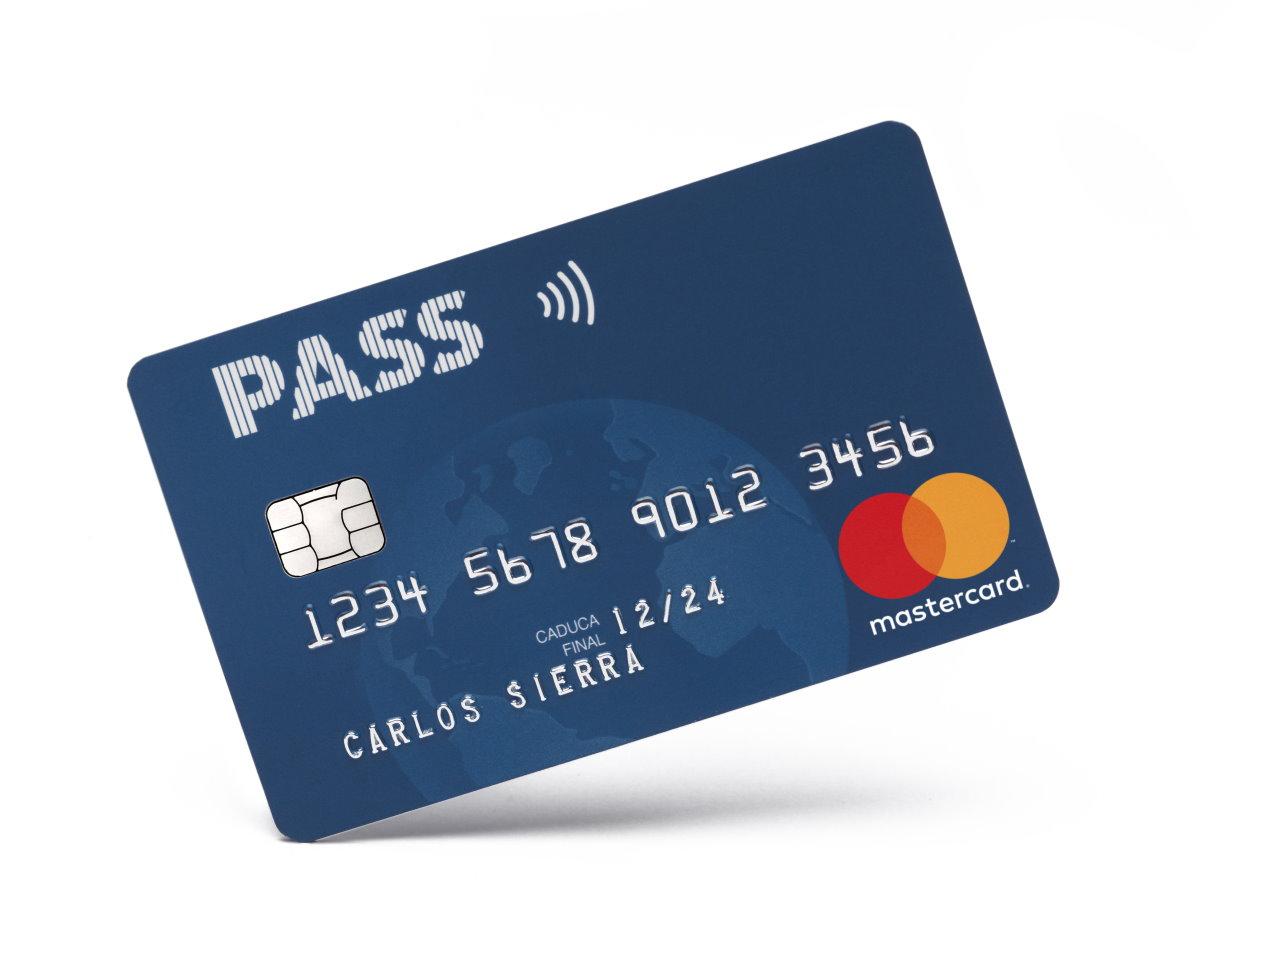 ¿Cómo reclamar intereses abusivos de la tarjeta Carrefour Pass?